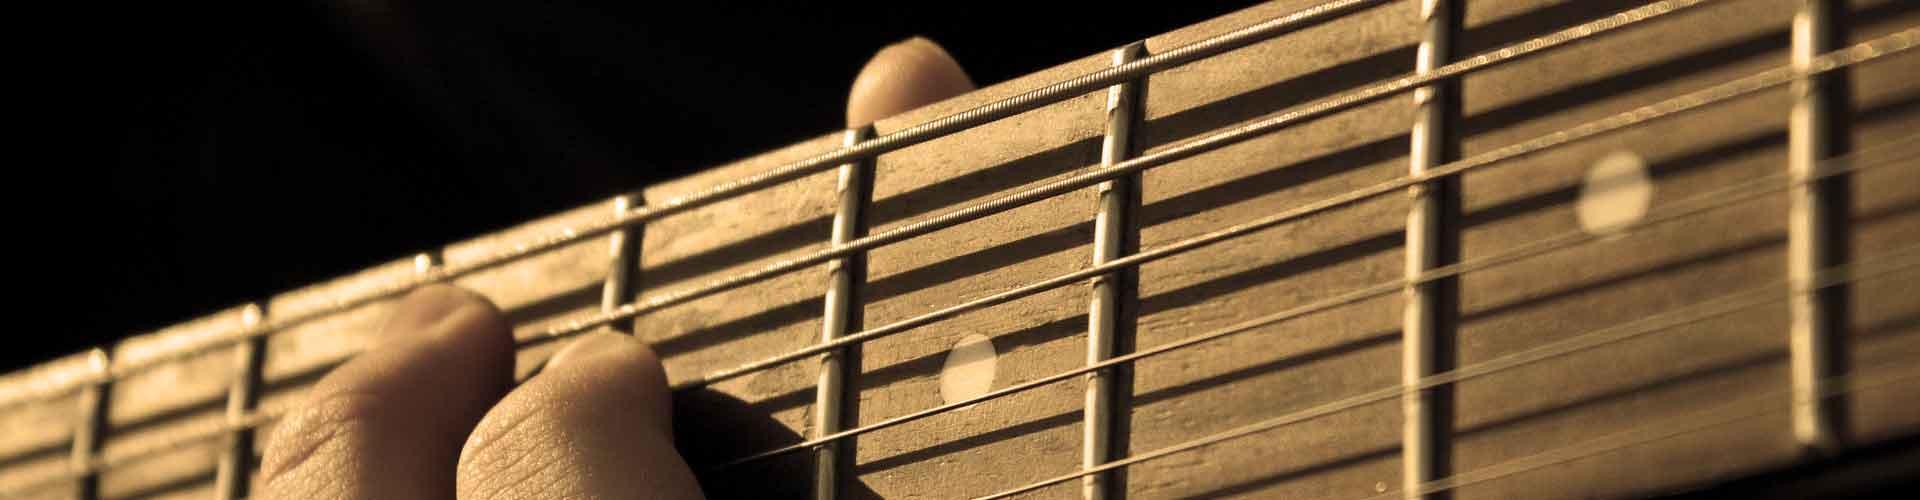 bundabstand berechnen f r alle gitarren mensuren. Black Bedroom Furniture Sets. Home Design Ideas